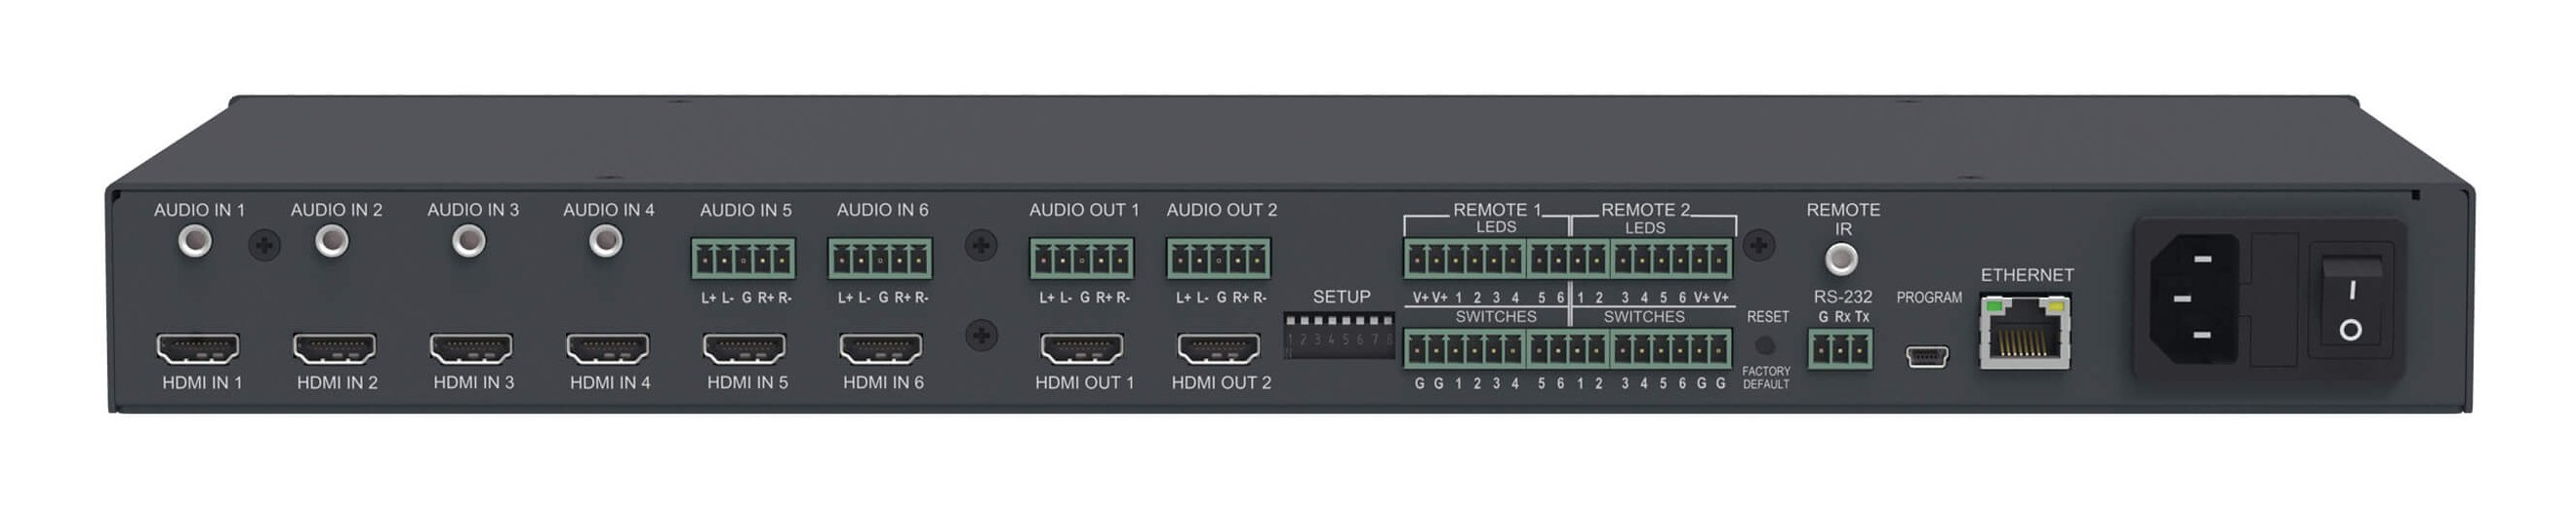 6x2 4K UHD HDMI/Audio Automatic Matrix Switcher